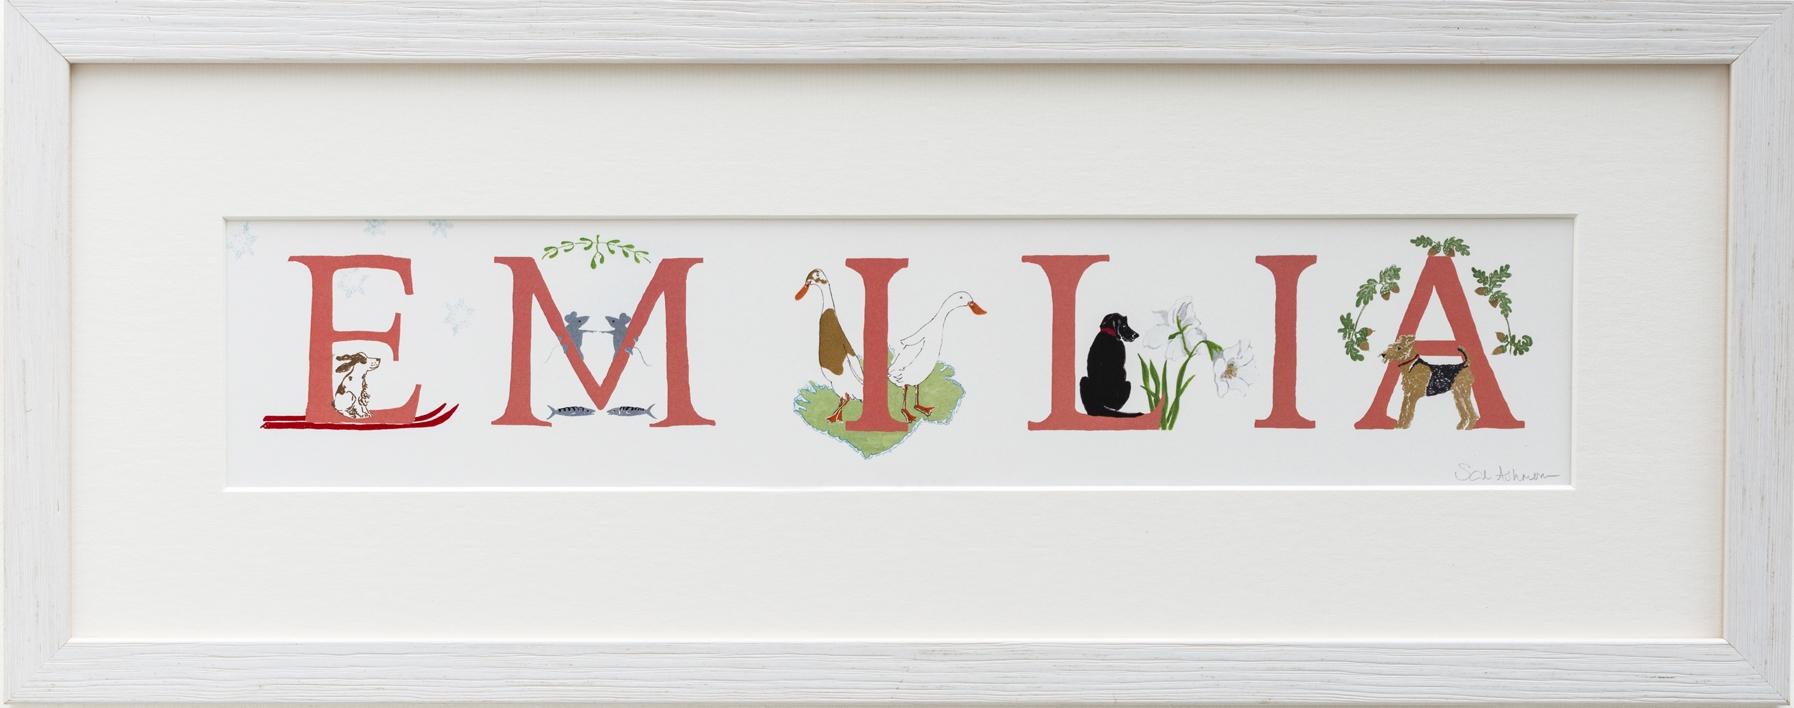 name-prints-emilia